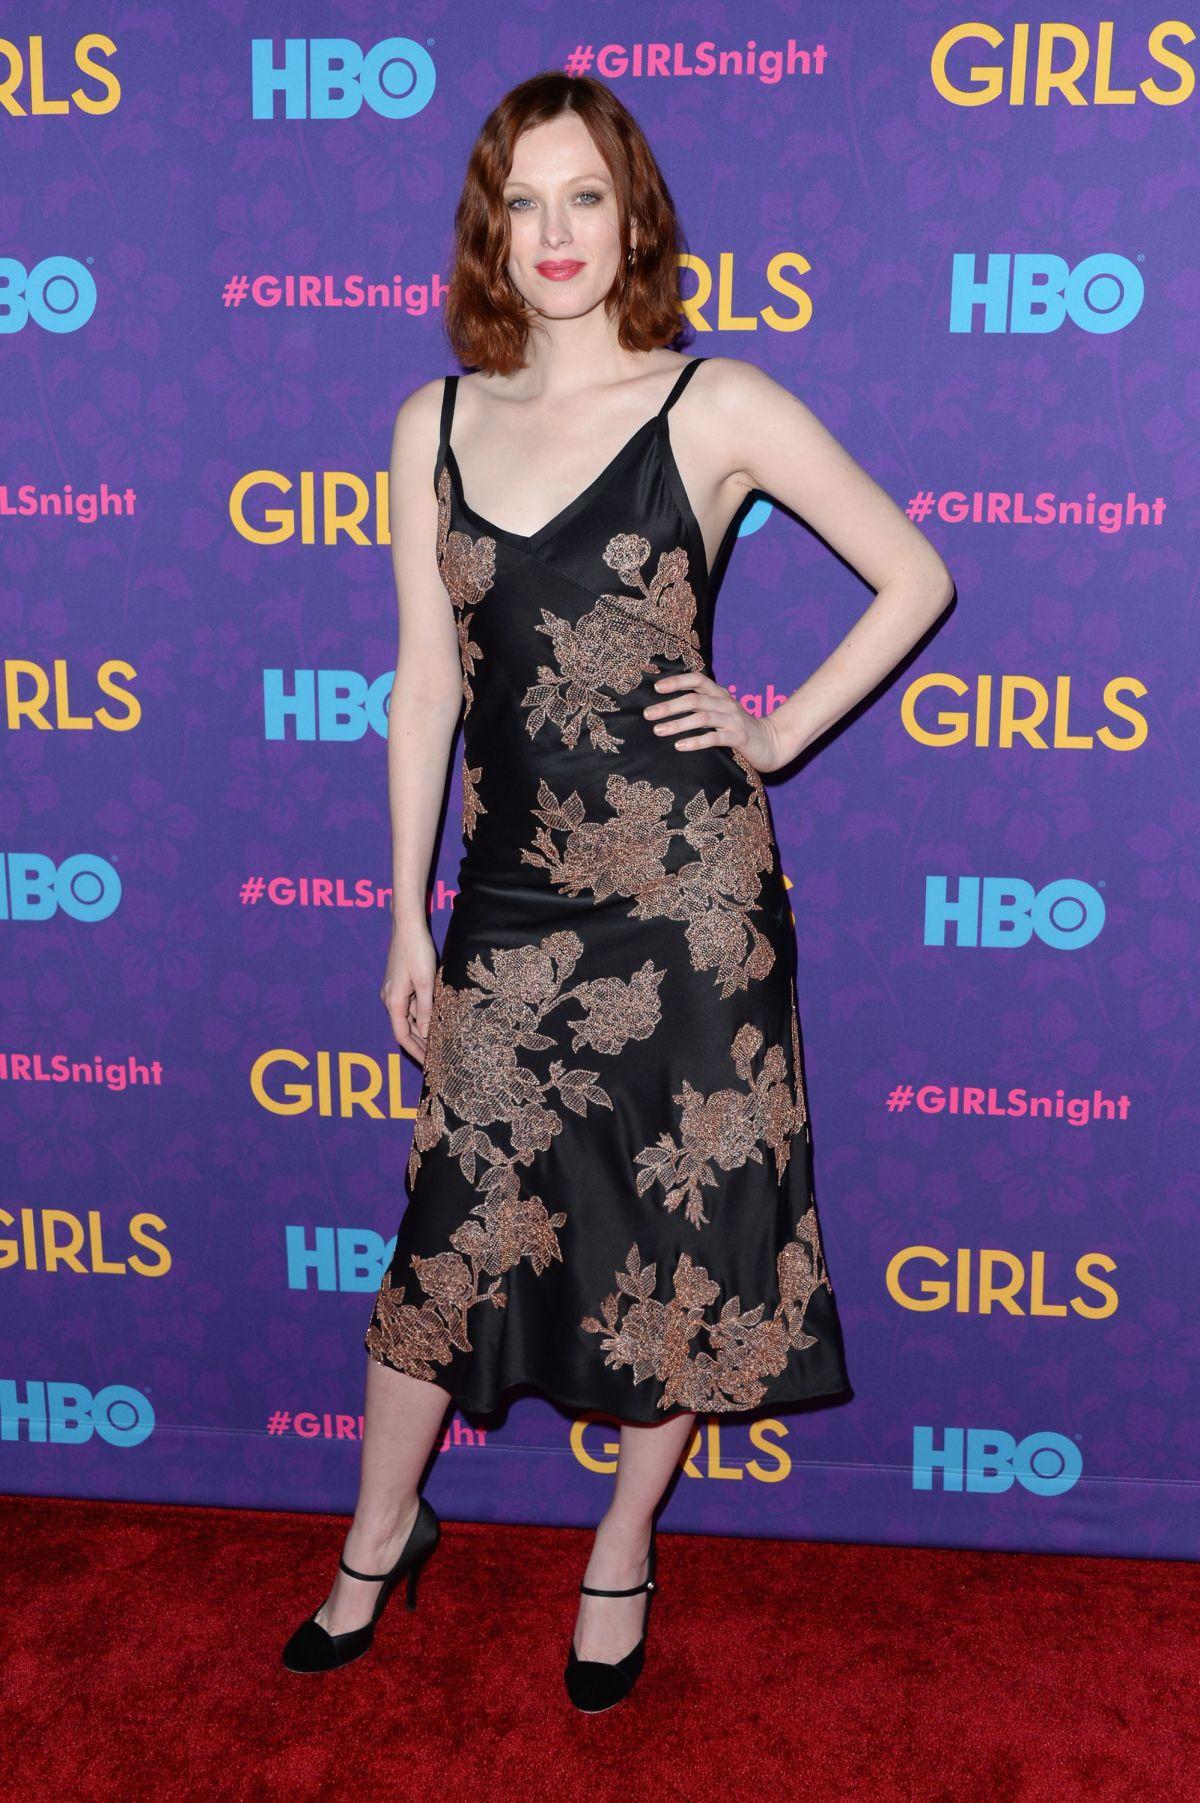 KAREN ELSON at Gorls Season 3 Premiere in New York